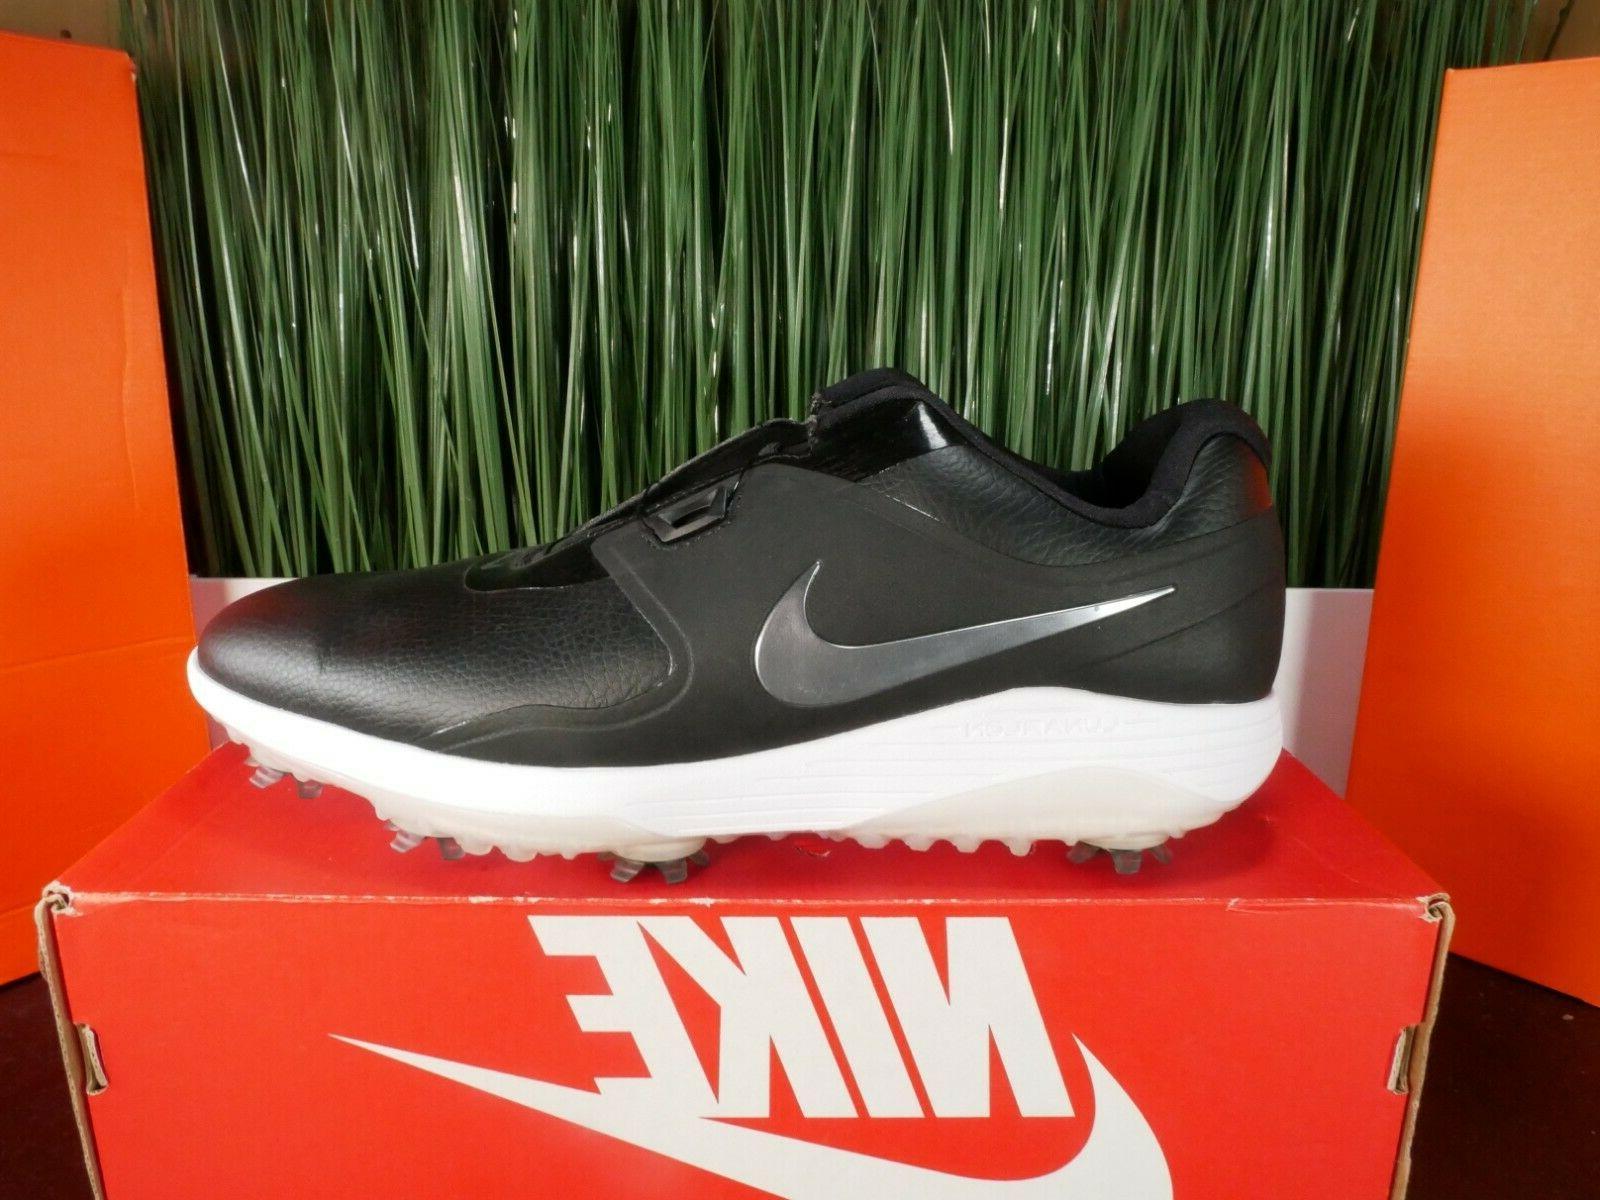 Nike Boa Mens Golf Black/White AQ1789-001 Multi Size